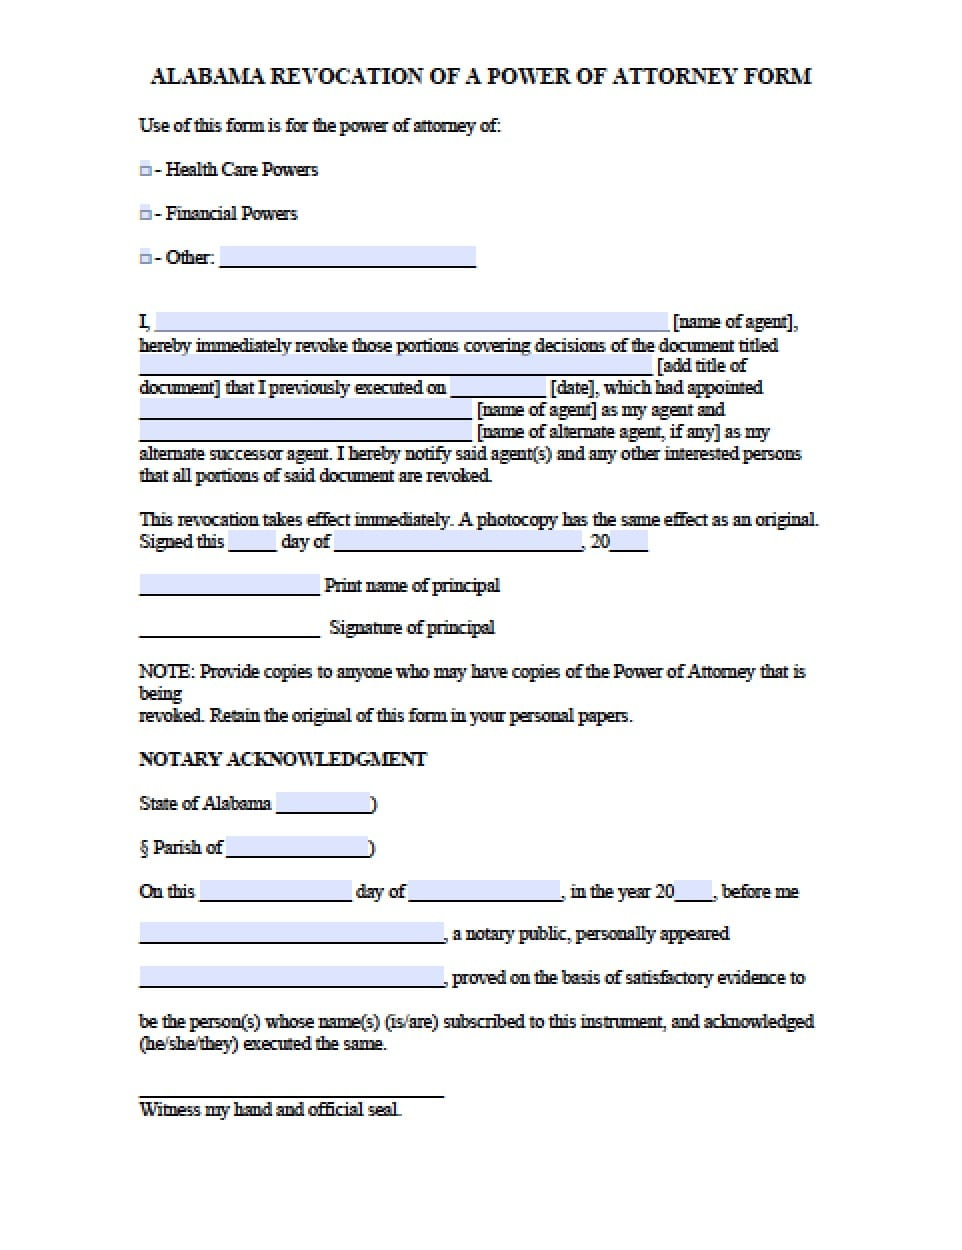 Blank power of attorney forms 3dienas blank power of attorney forms falaconquin